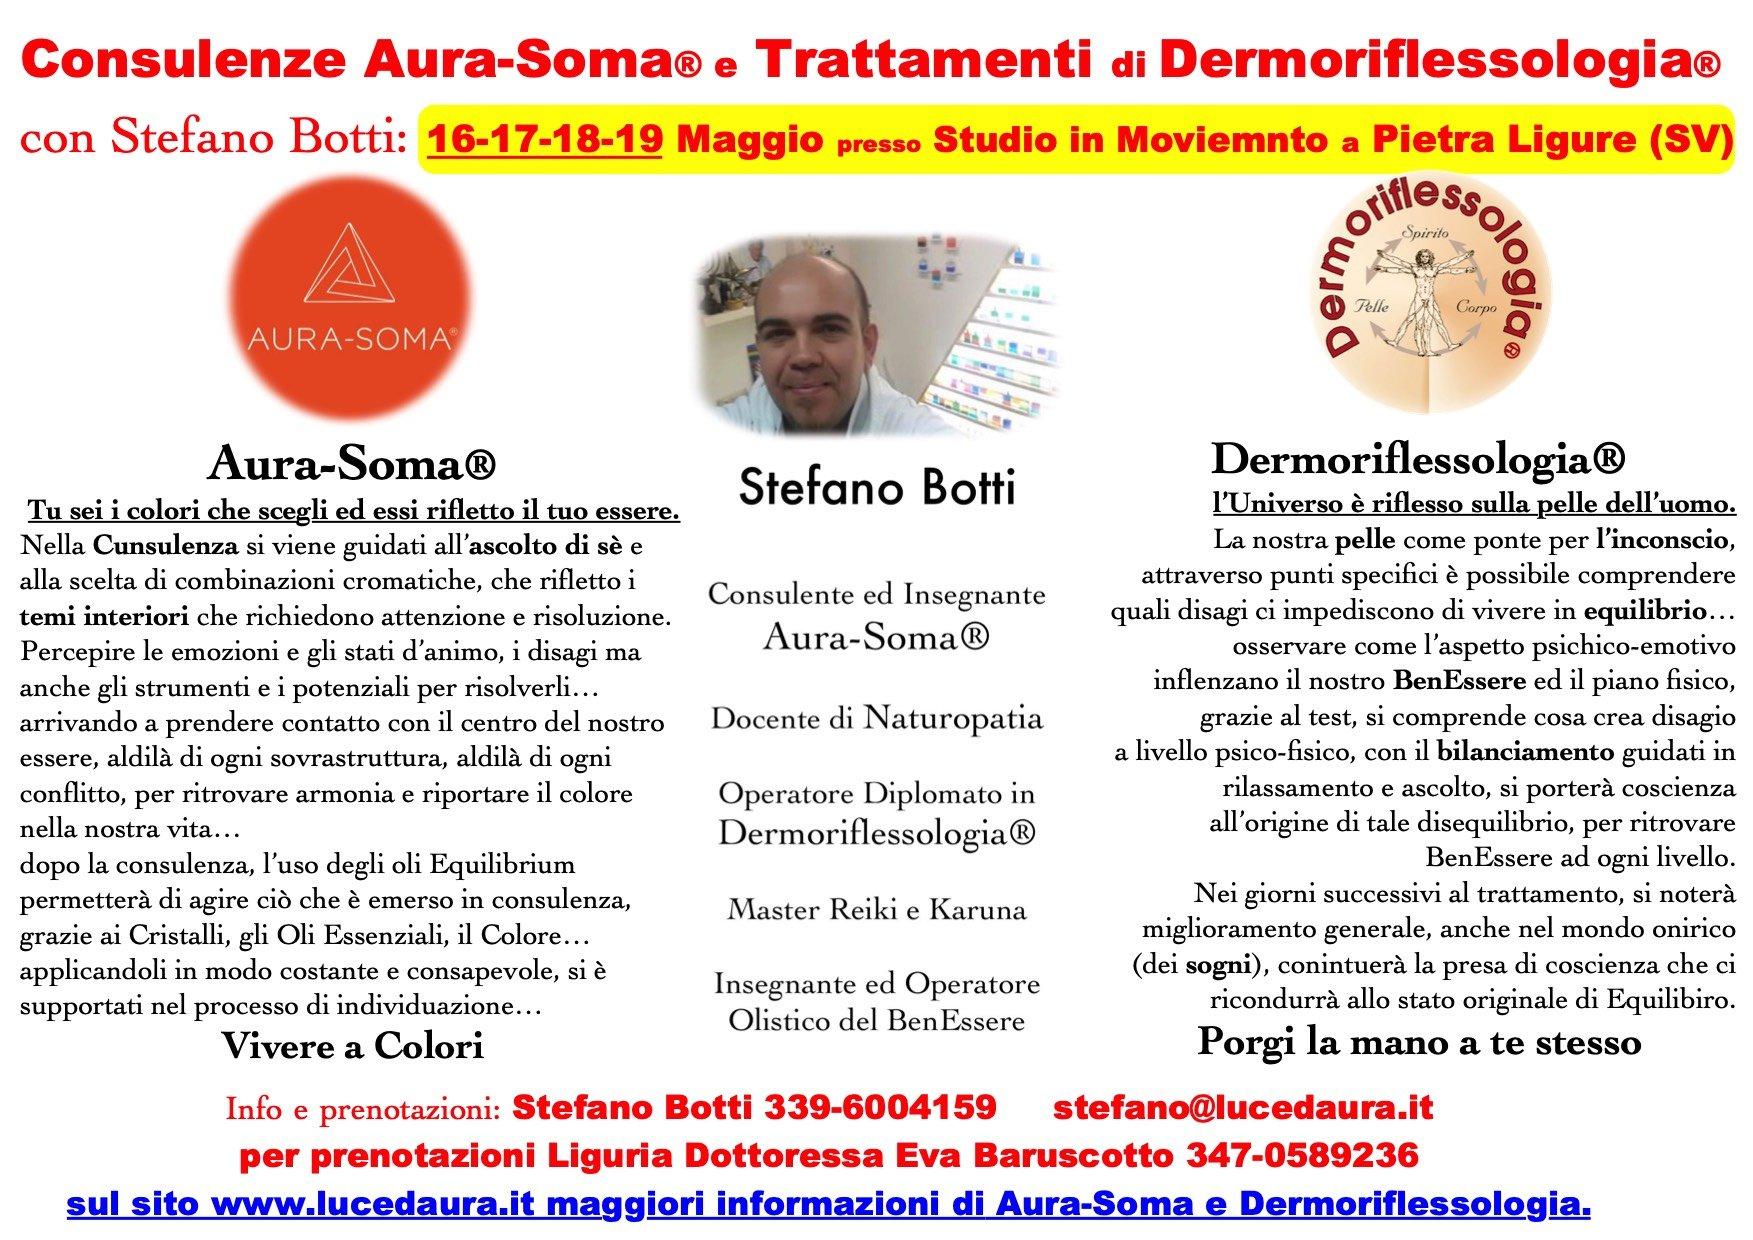 aura-soma-dermoriflessologia-aurasoma-vicky-wall-calligaris-giuseppe